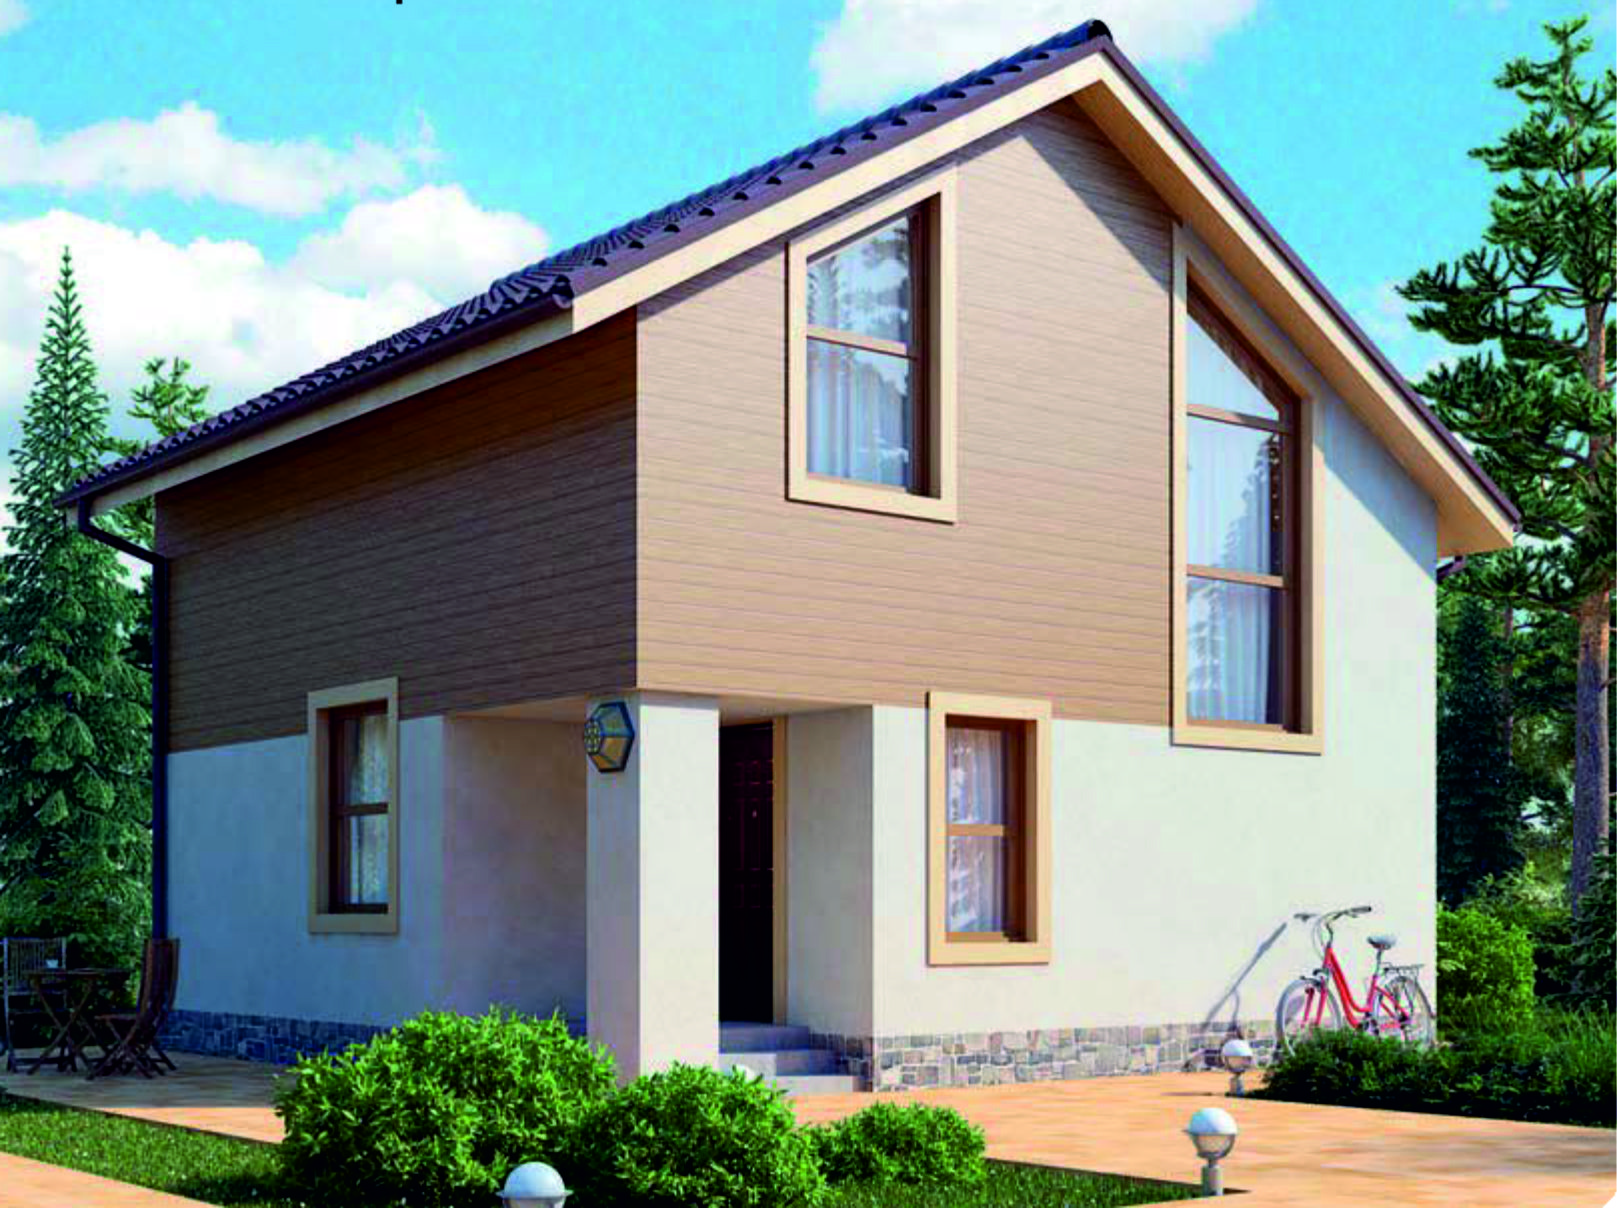 проект дома из газобетона JB-2053 строительство под ключ за 24900 р./м2 <br>итого 2 938 200 руб.  рублей